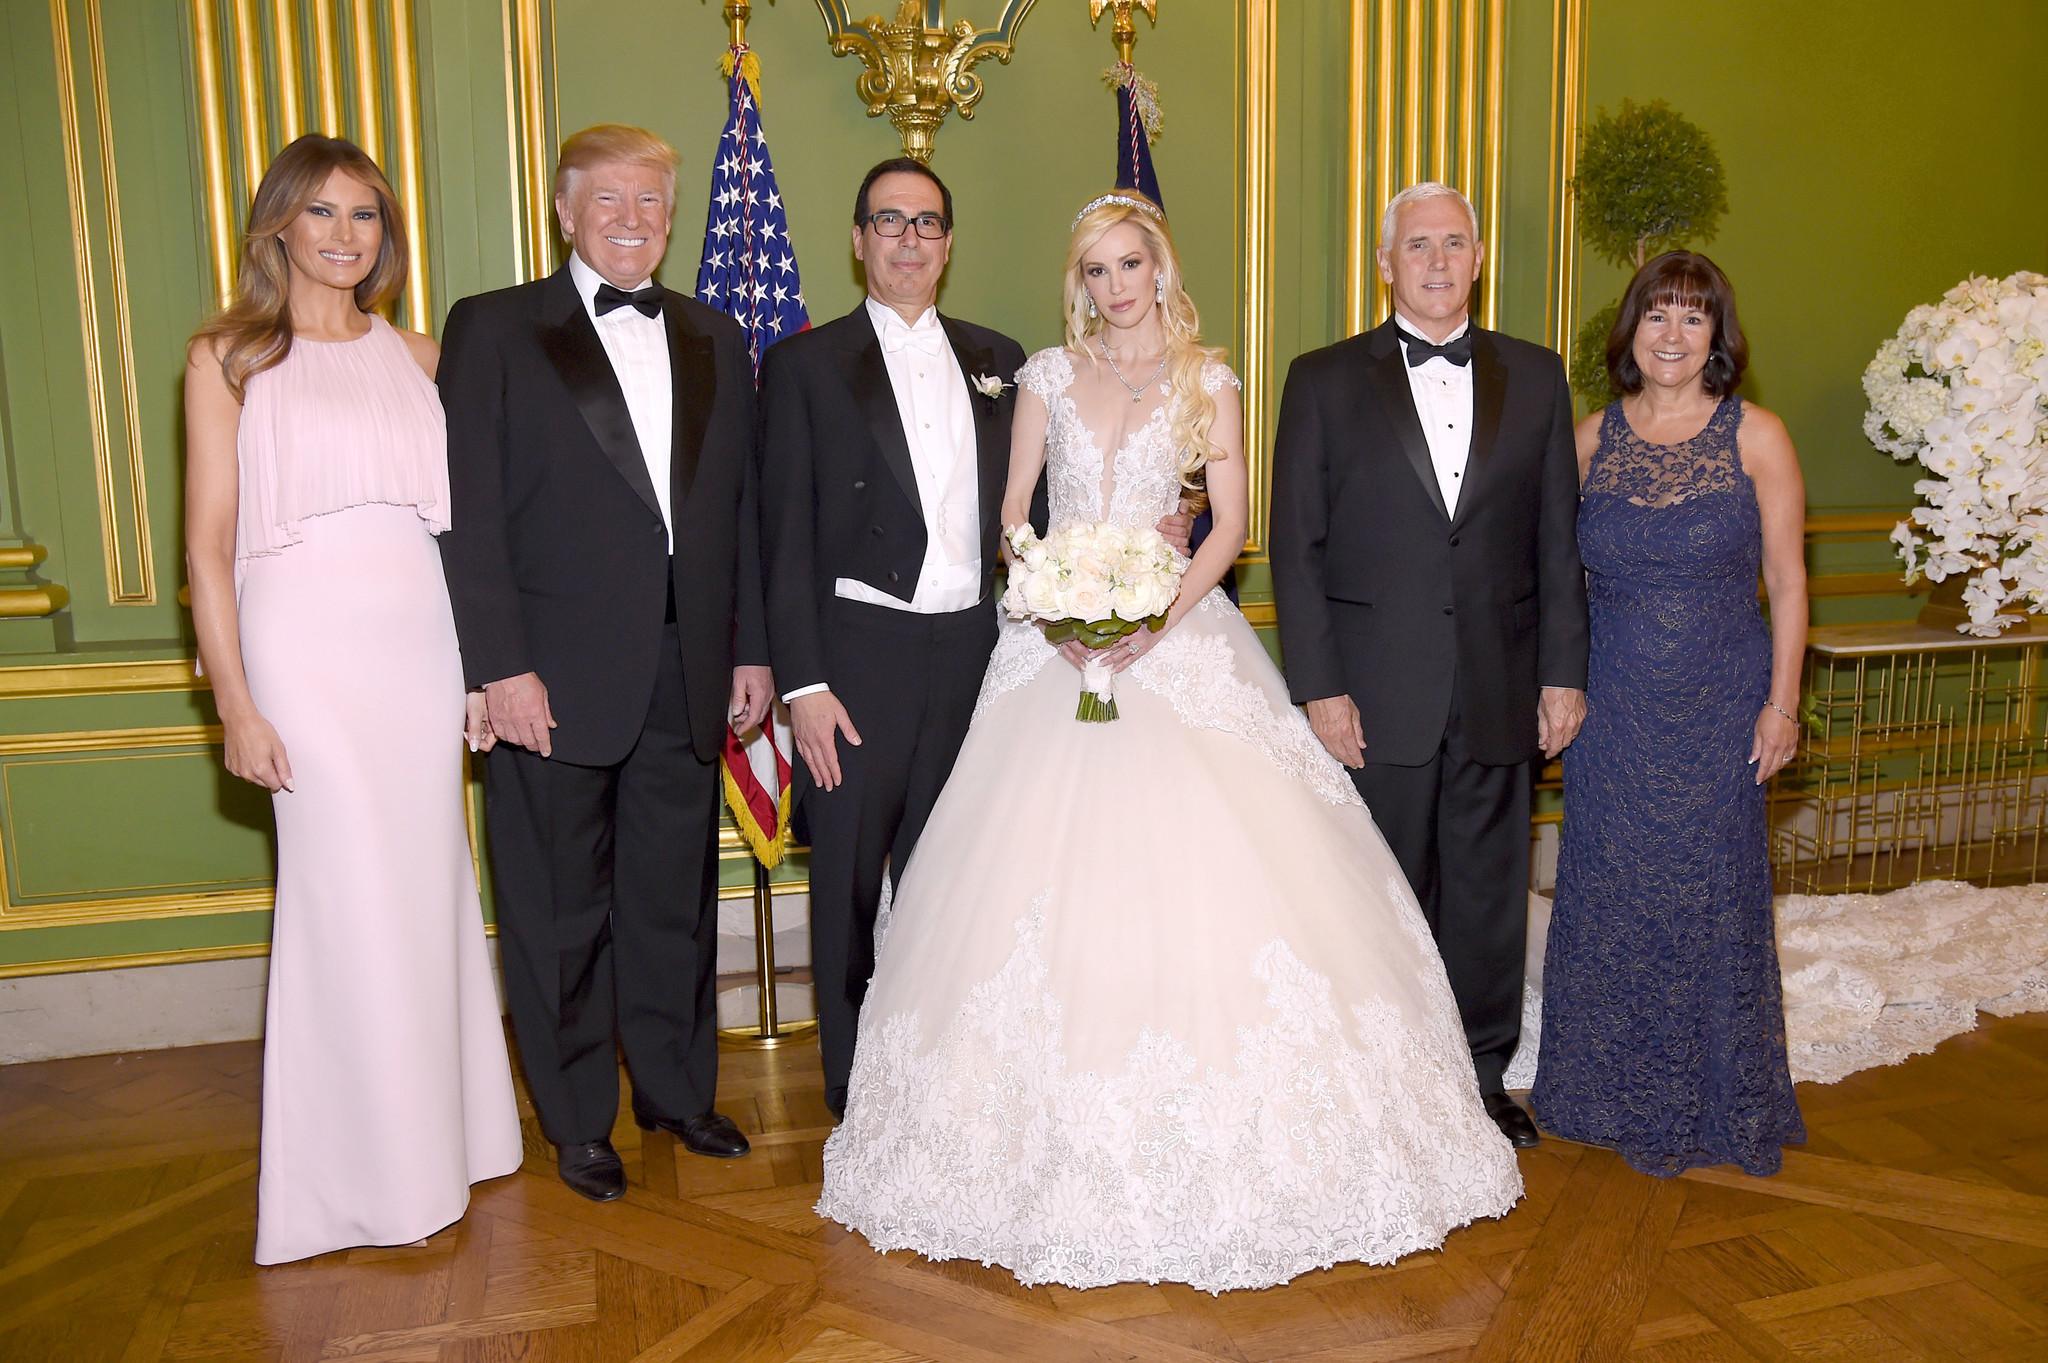 First Lady Melania Trump, President Trump, Treasury Secretary Steven T. Mnuchin, Louise Linton, Vice President Mike Pence and Karen Pence at Mnuchin's wedding in Washington on June 24, 2017. (Kevin Mazur / Getty Images)